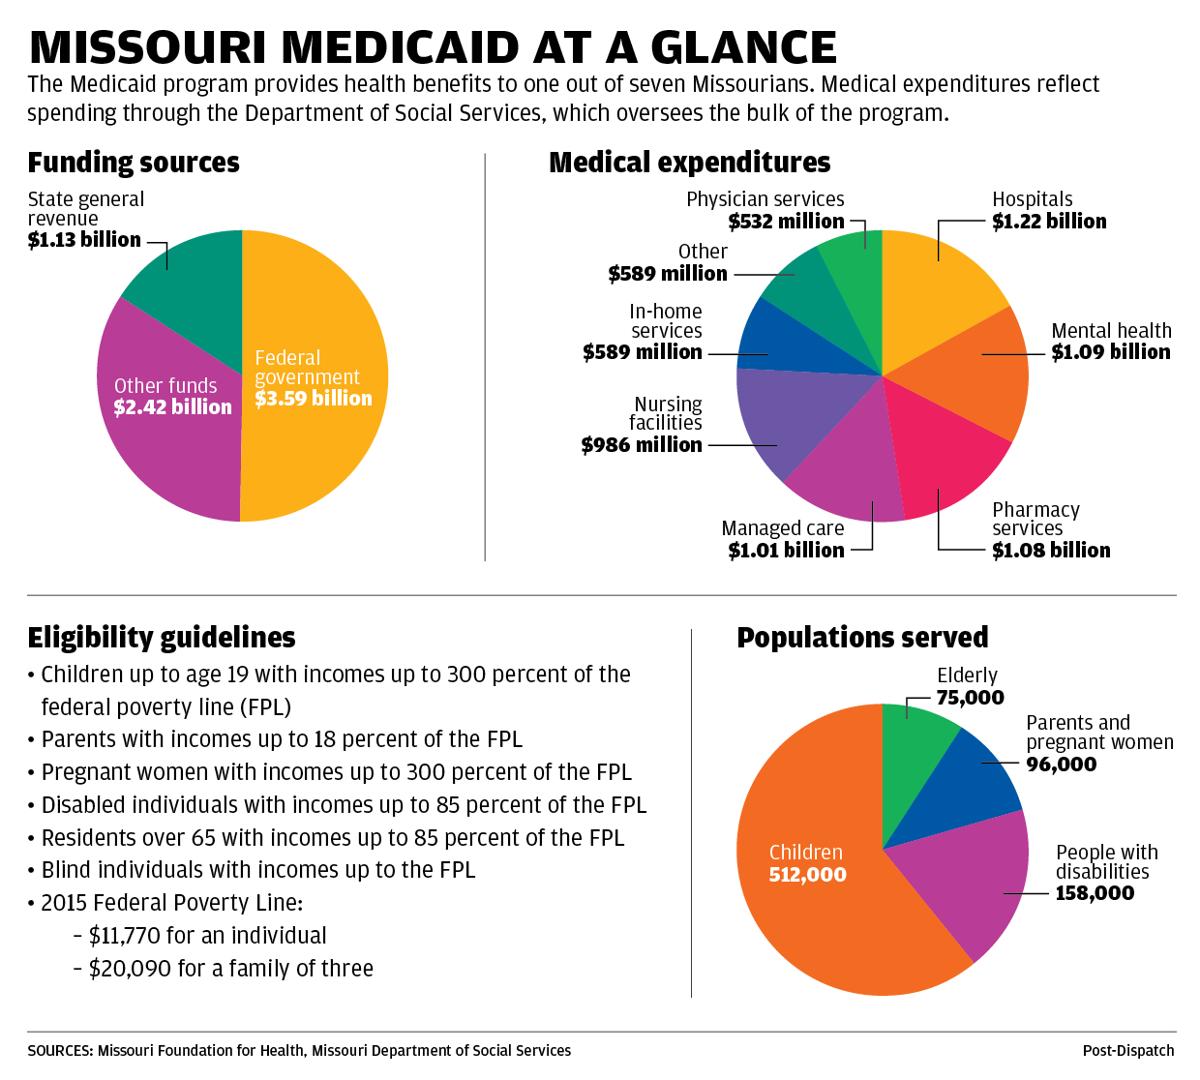 Chart: Missouri Medicaid at a glance